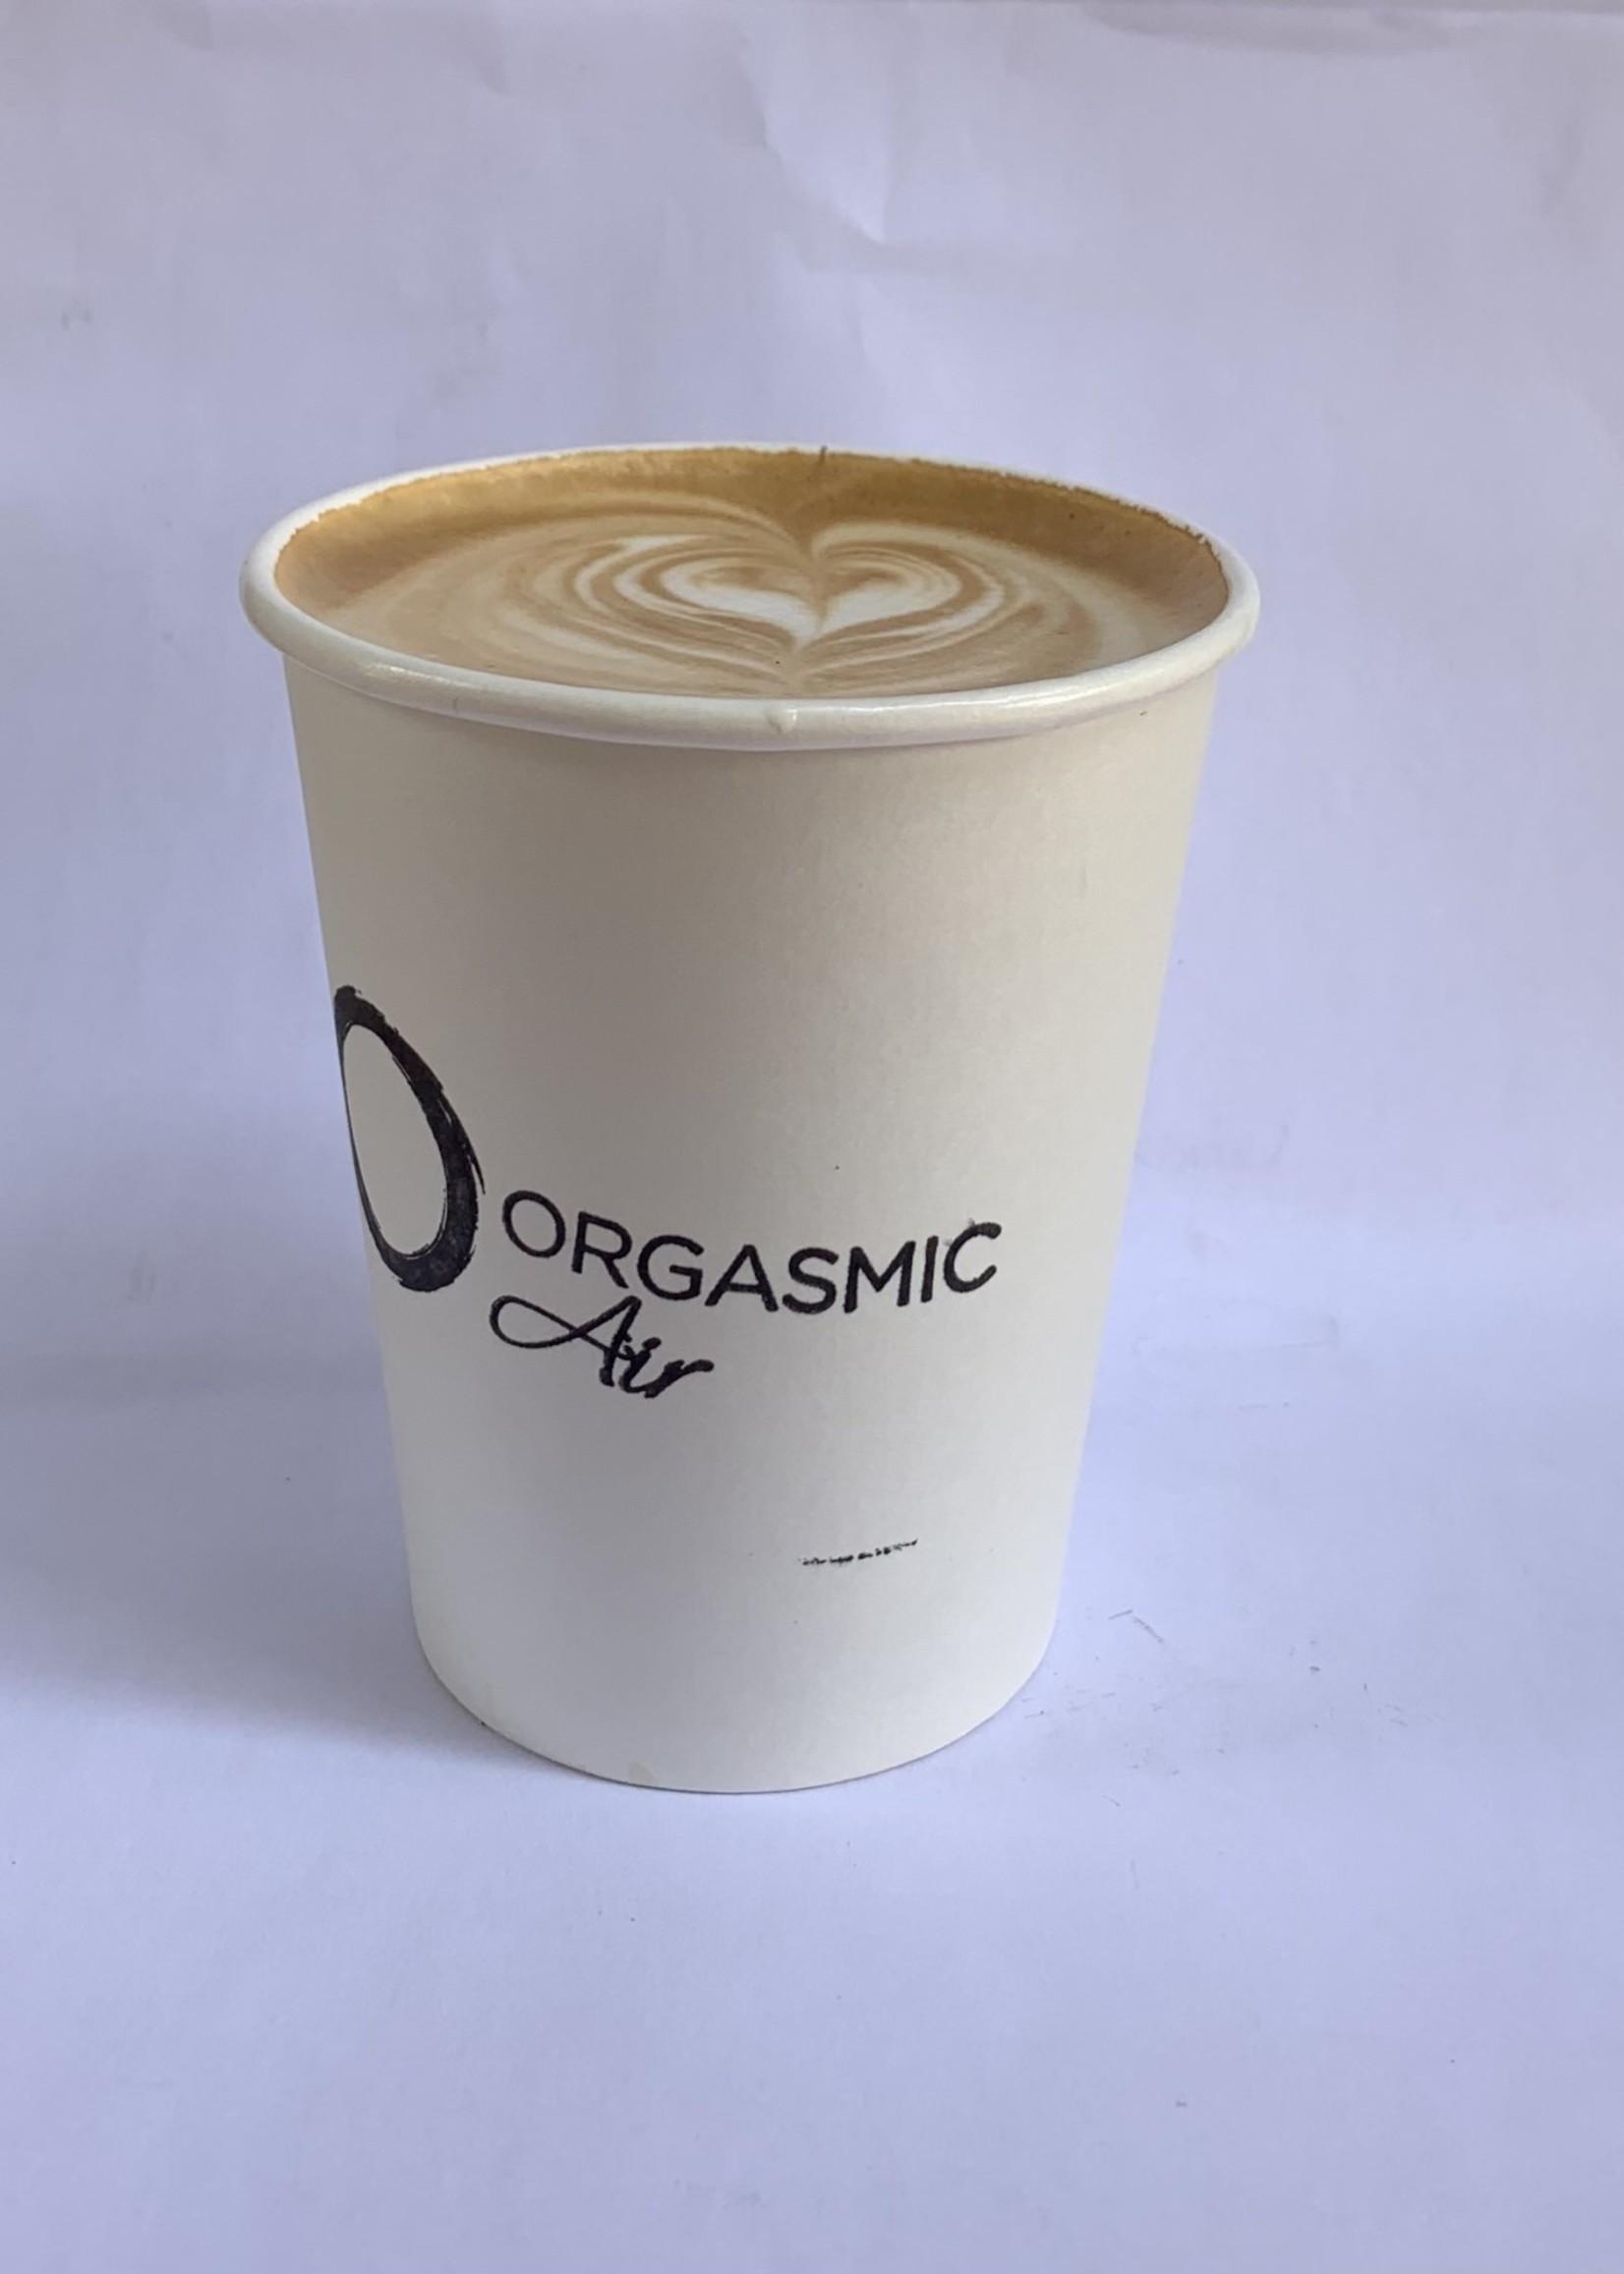 Organic & Air Double cappuccino